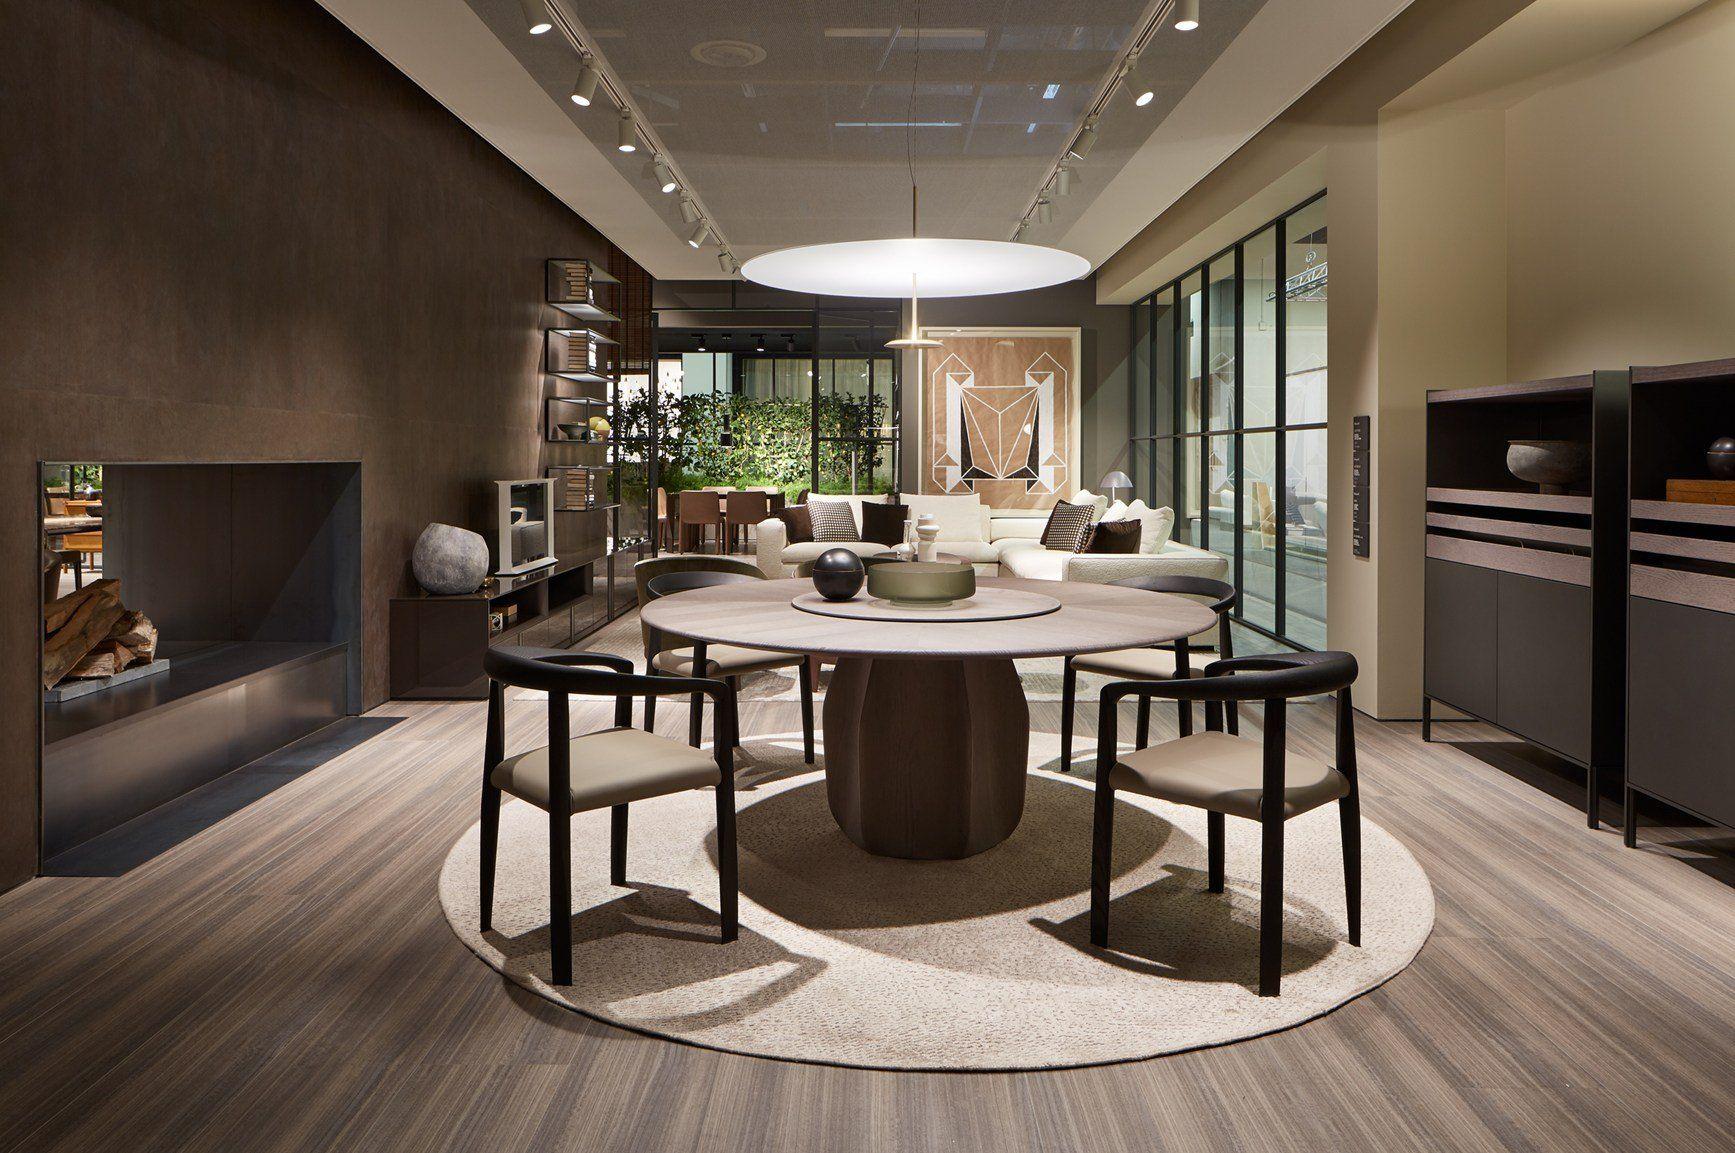 molteni c and vincent van duysen at imm. Black Bedroom Furniture Sets. Home Design Ideas